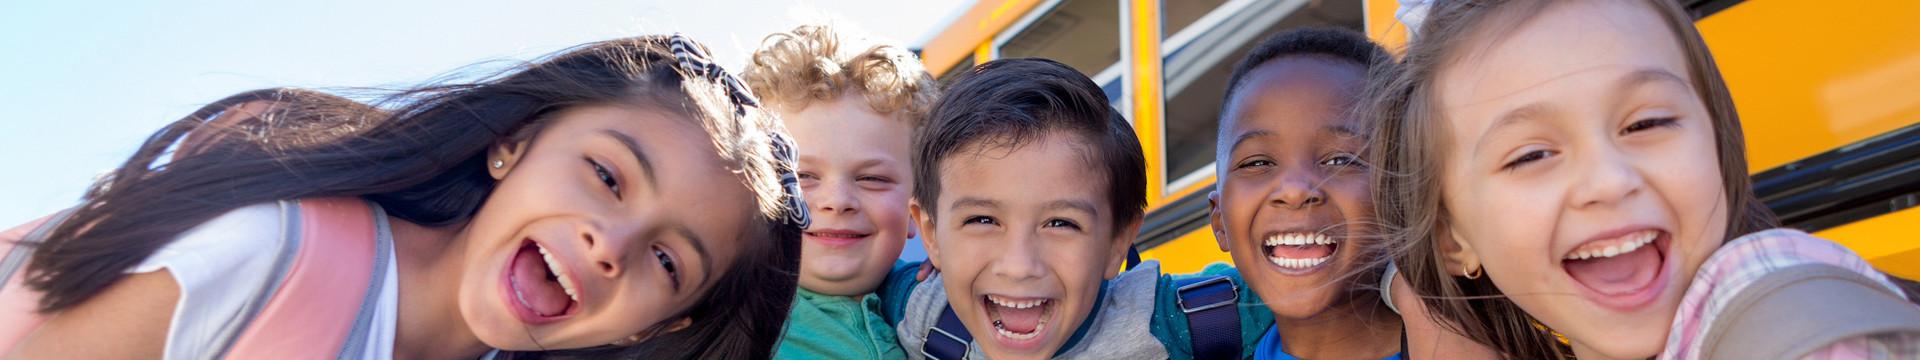 School Trip Hotel Deals Near Disney World - Kids near a school bus